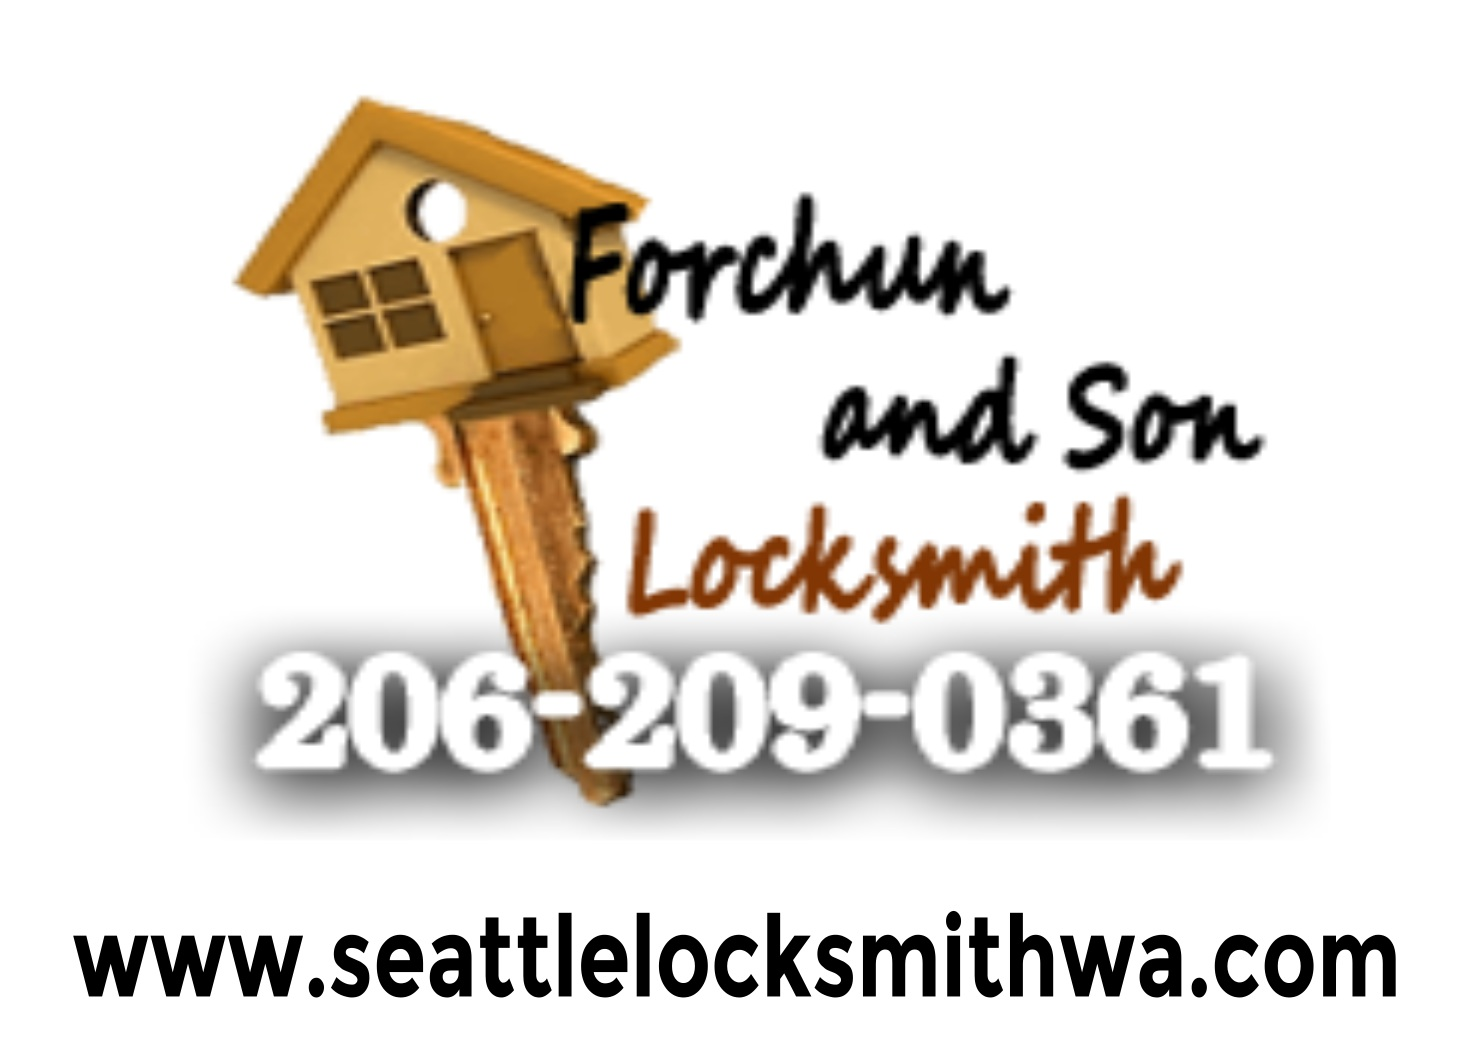 Forchun and Son Locksmith